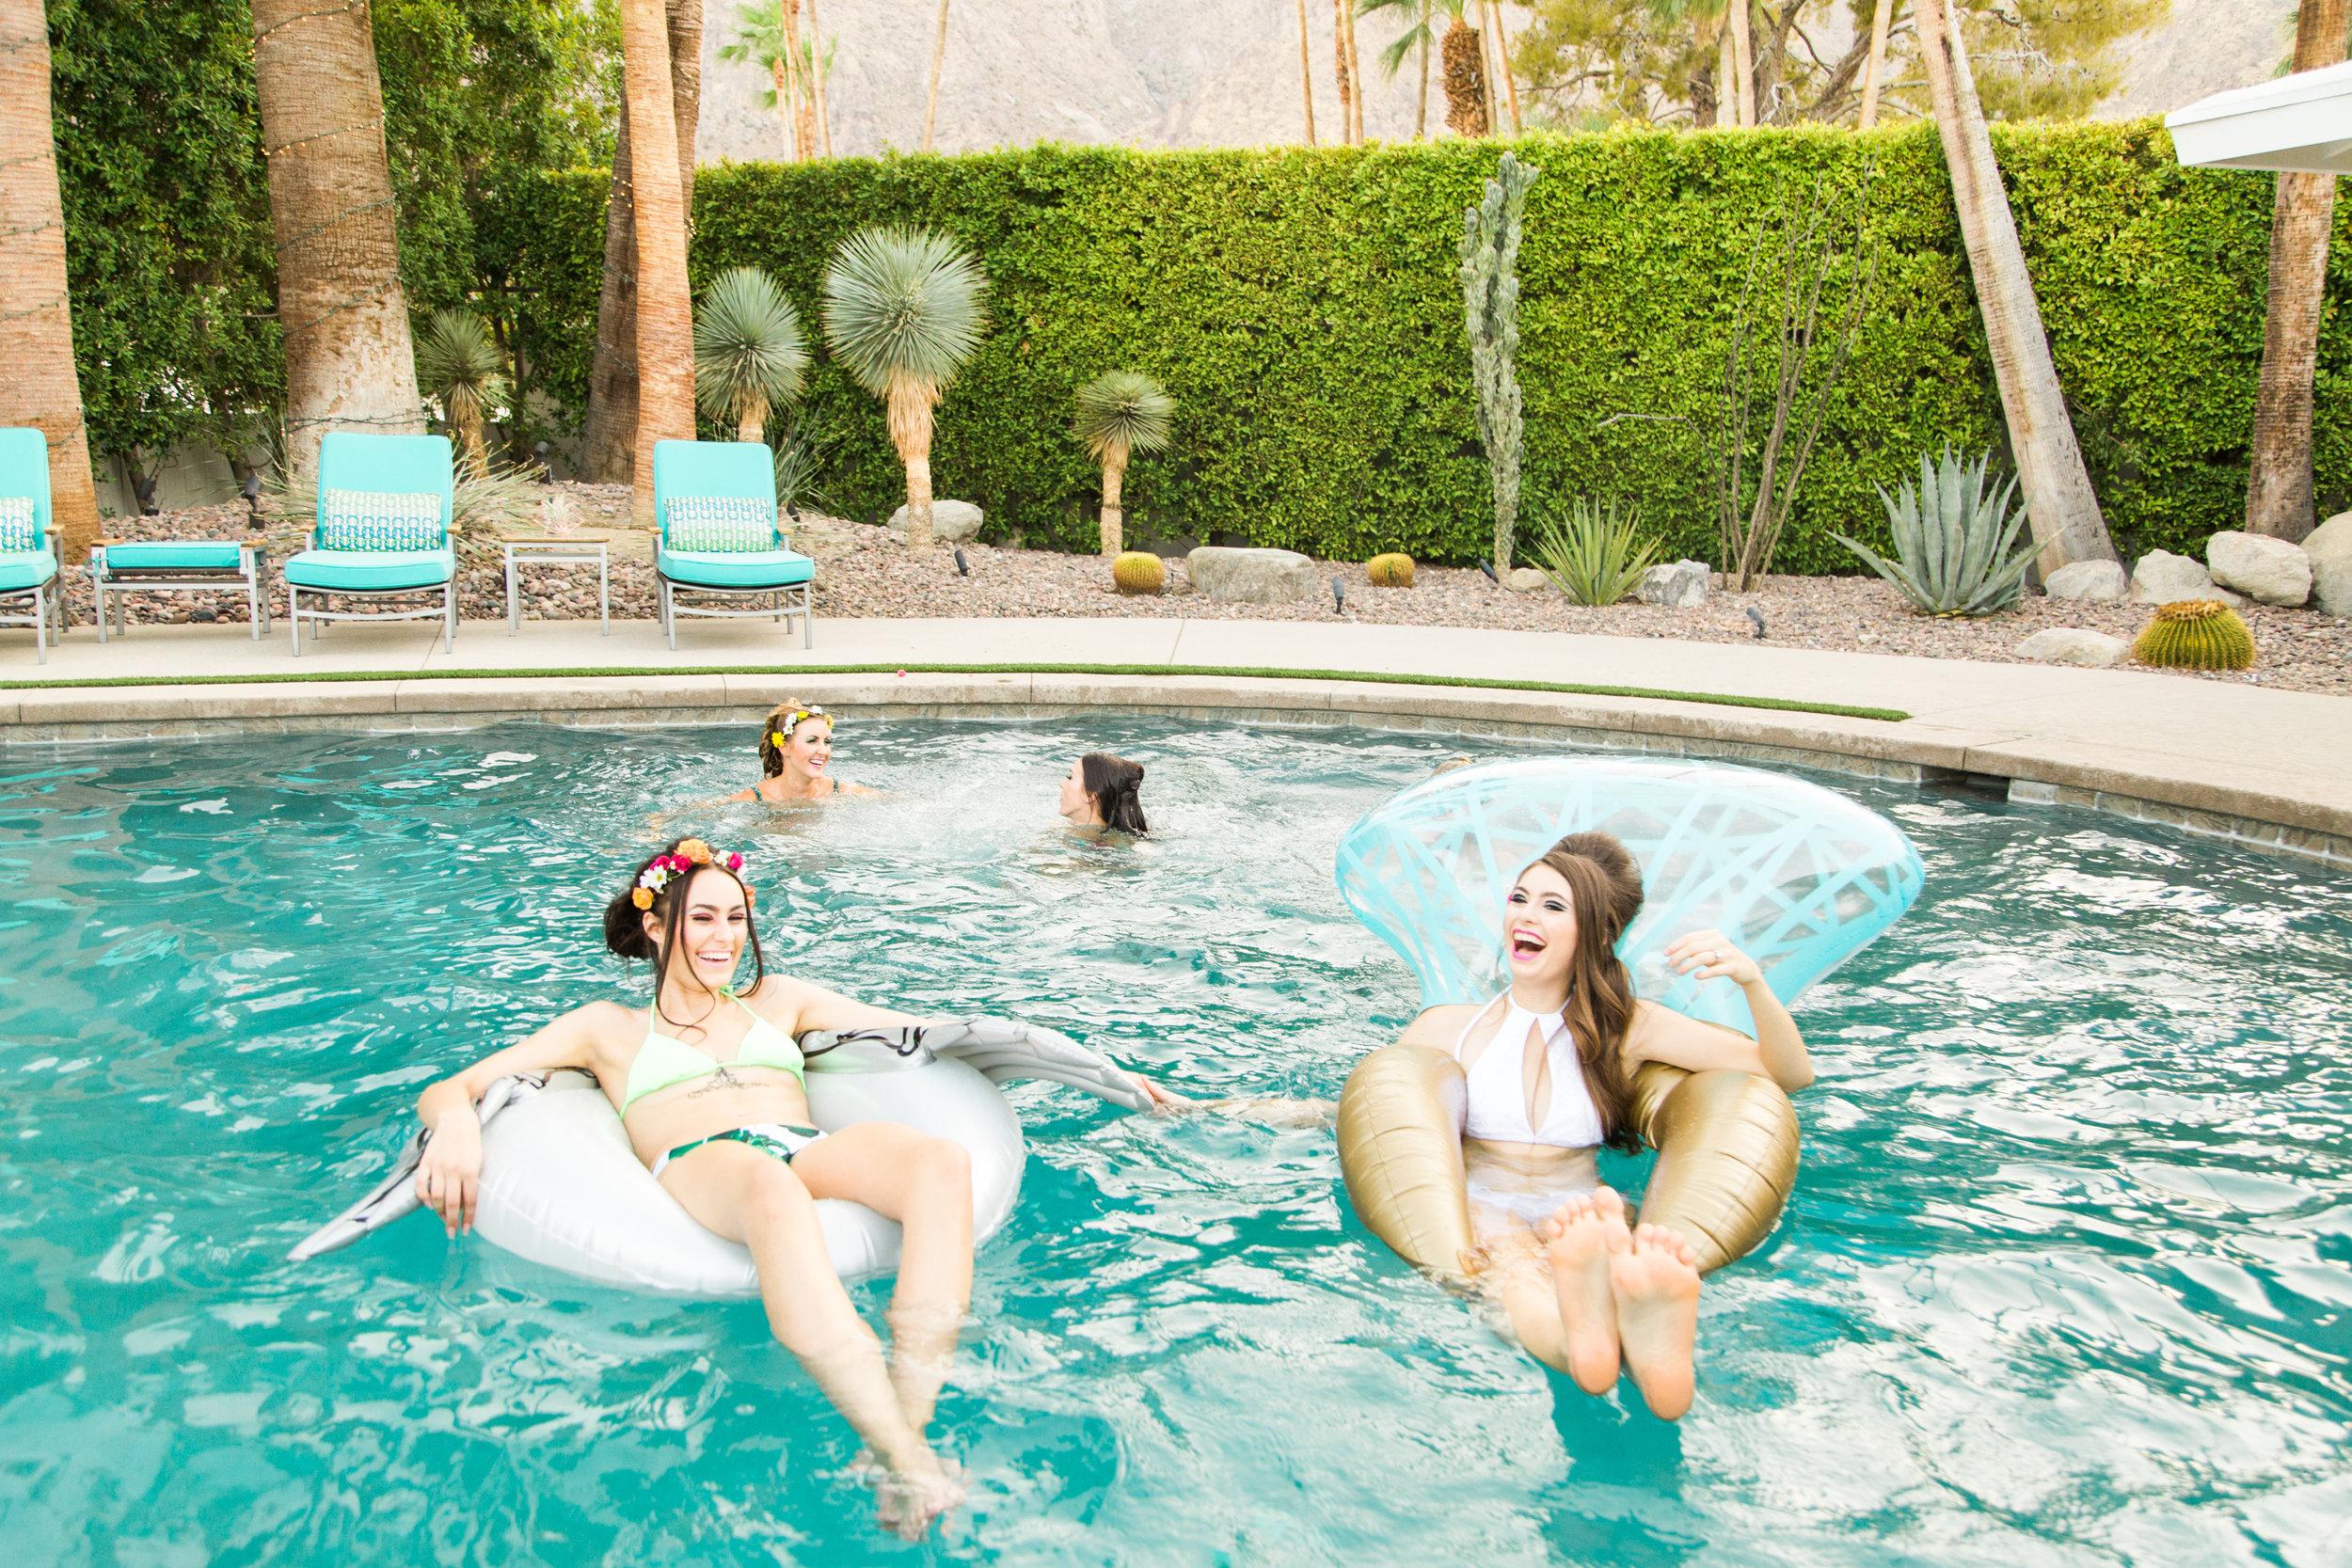 Palm Springs Bachelorette Party - Old Las Palmas Bachelorette Party - 60's Bachelorette Party